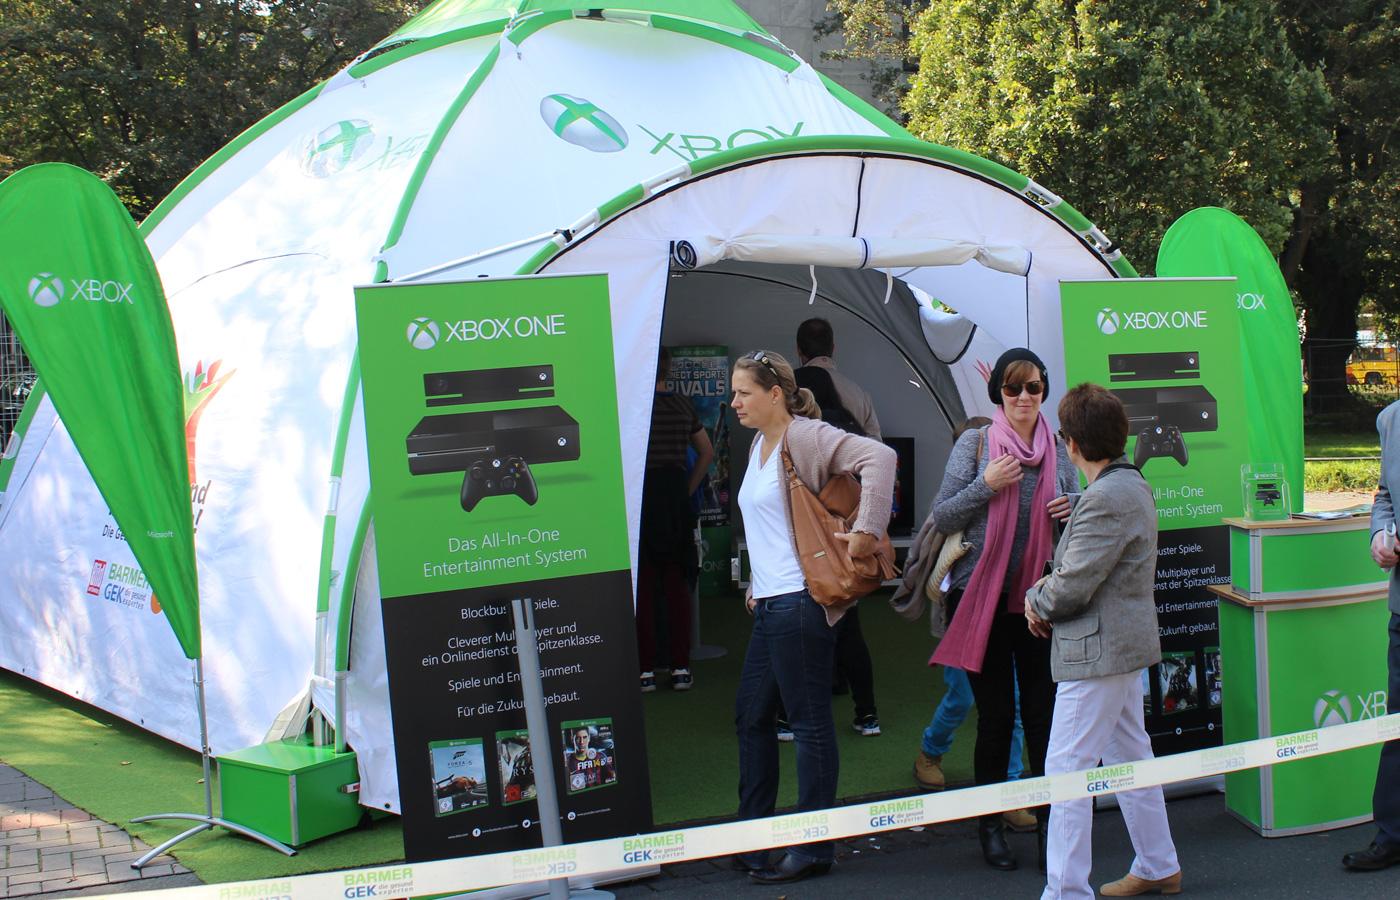 Microsoft- Xbox Barmer Roadshow